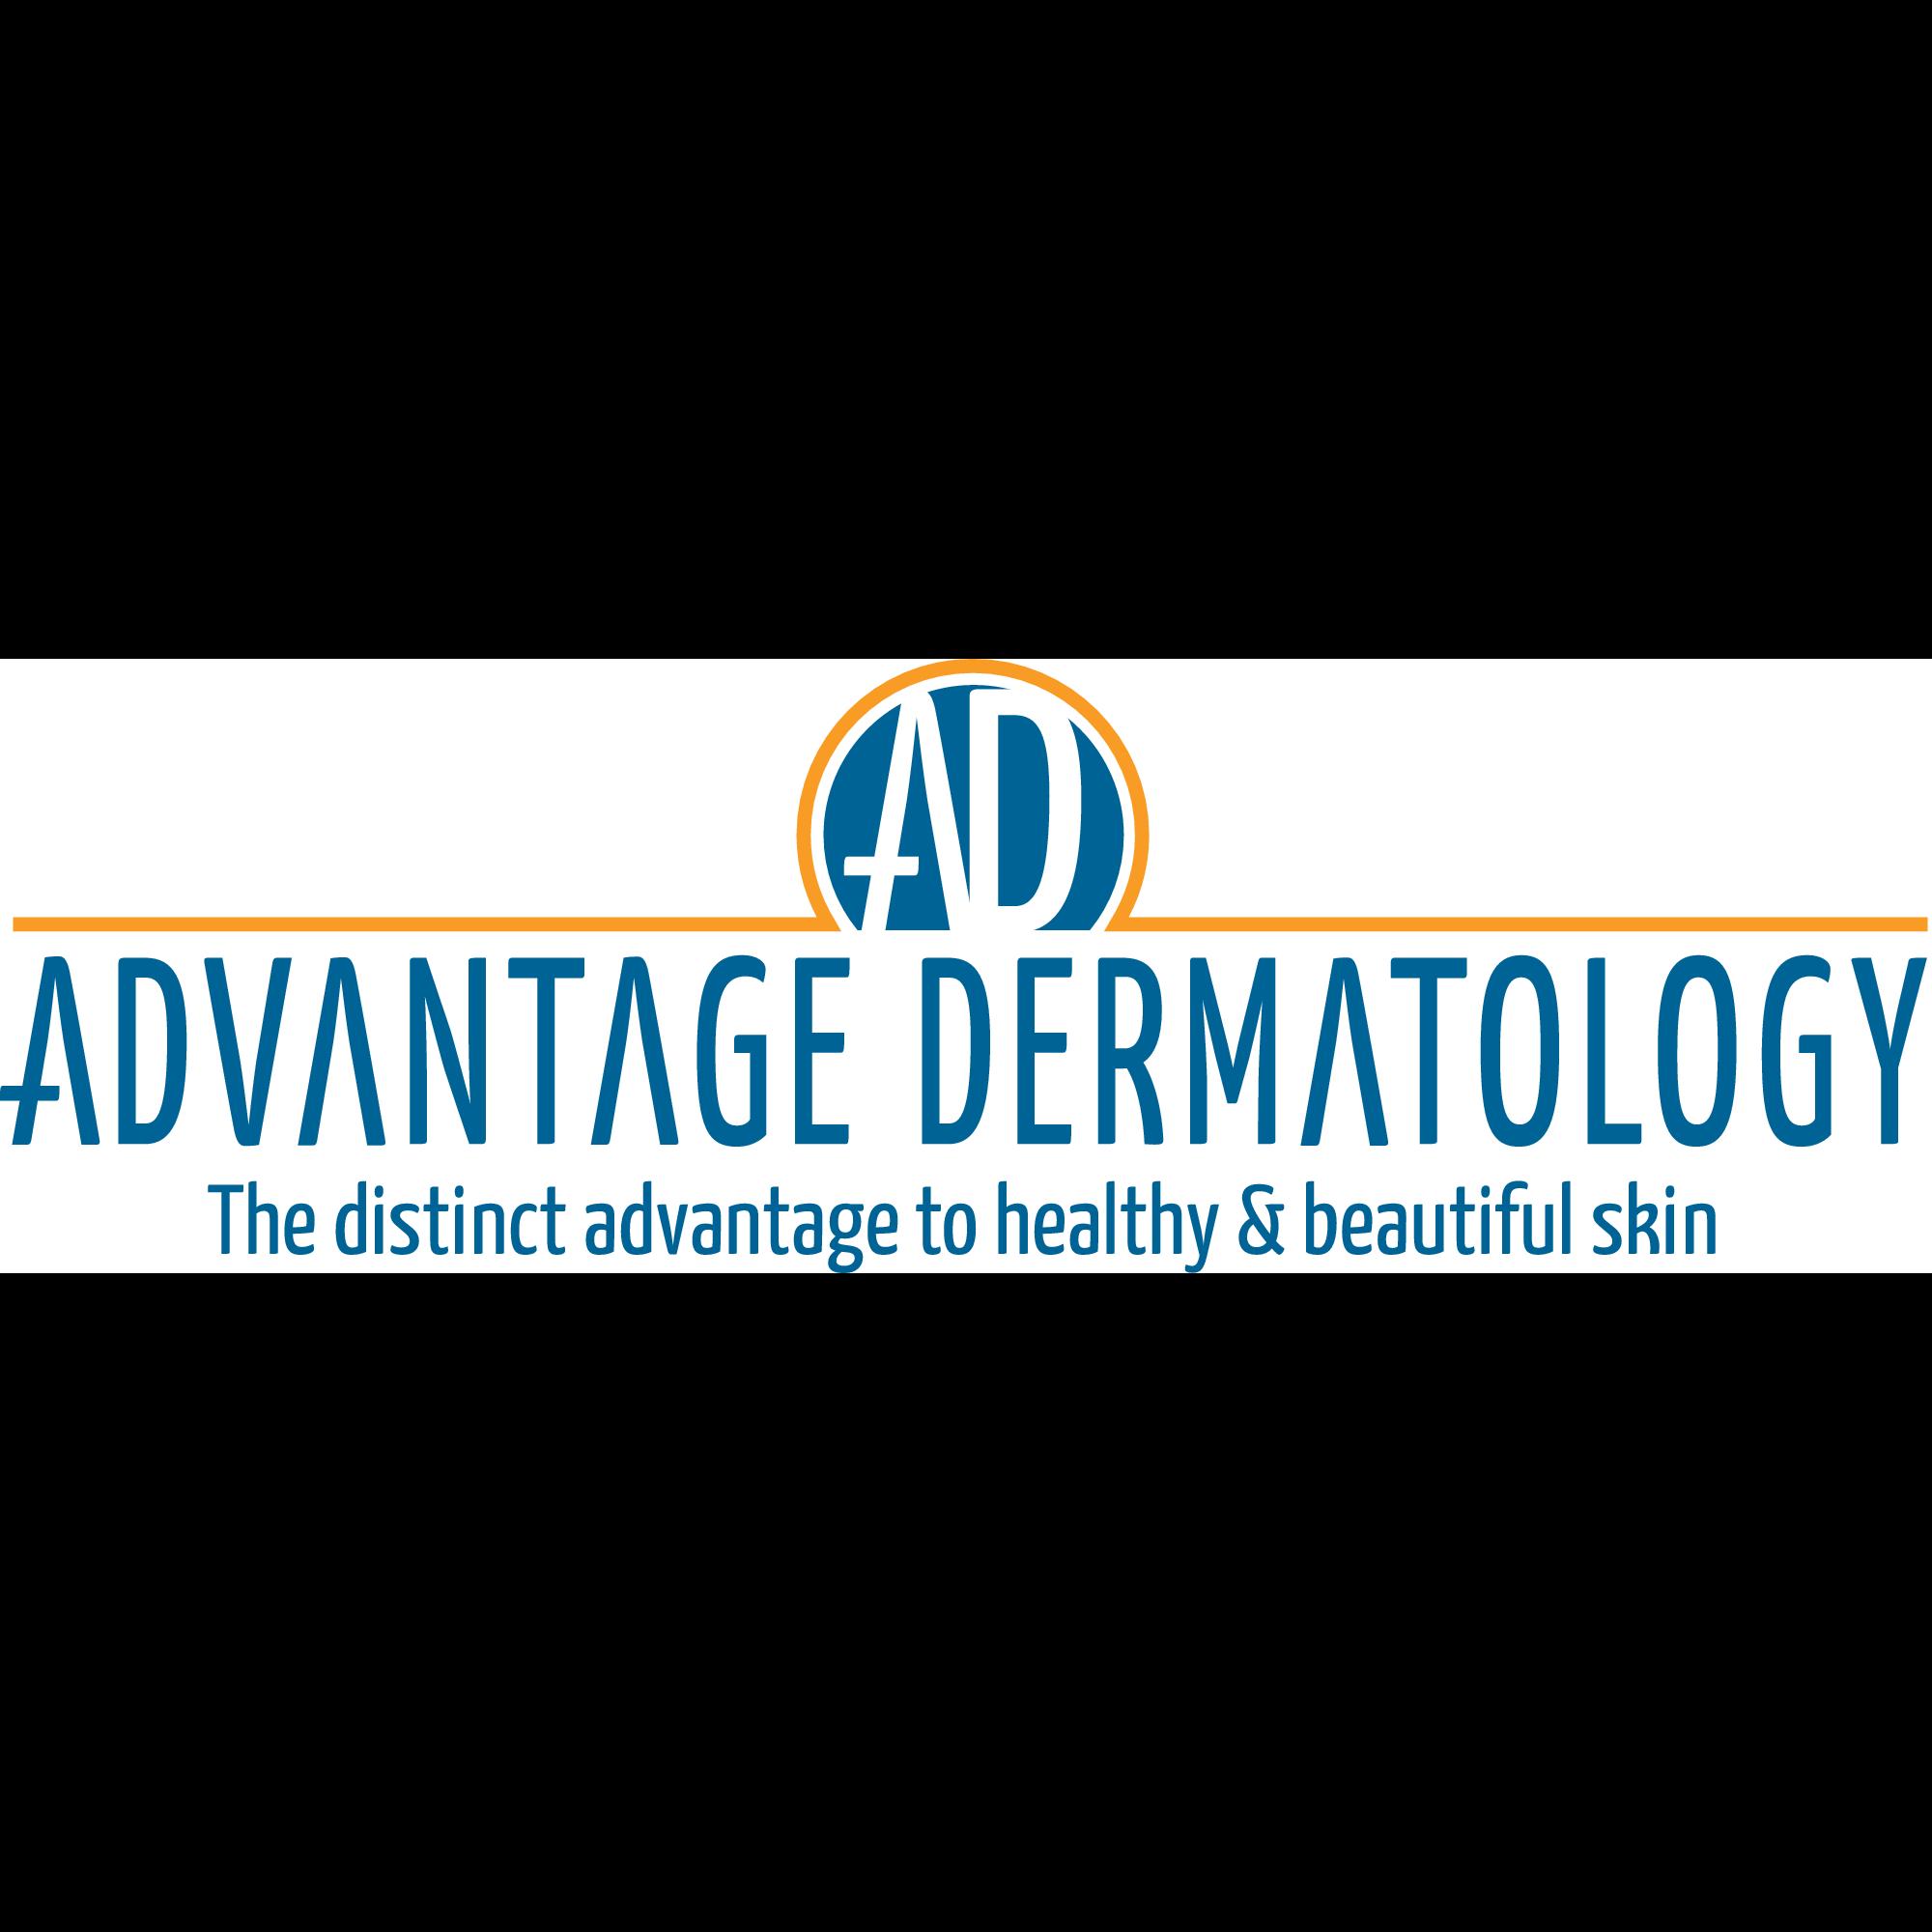 Advantage Dermatology